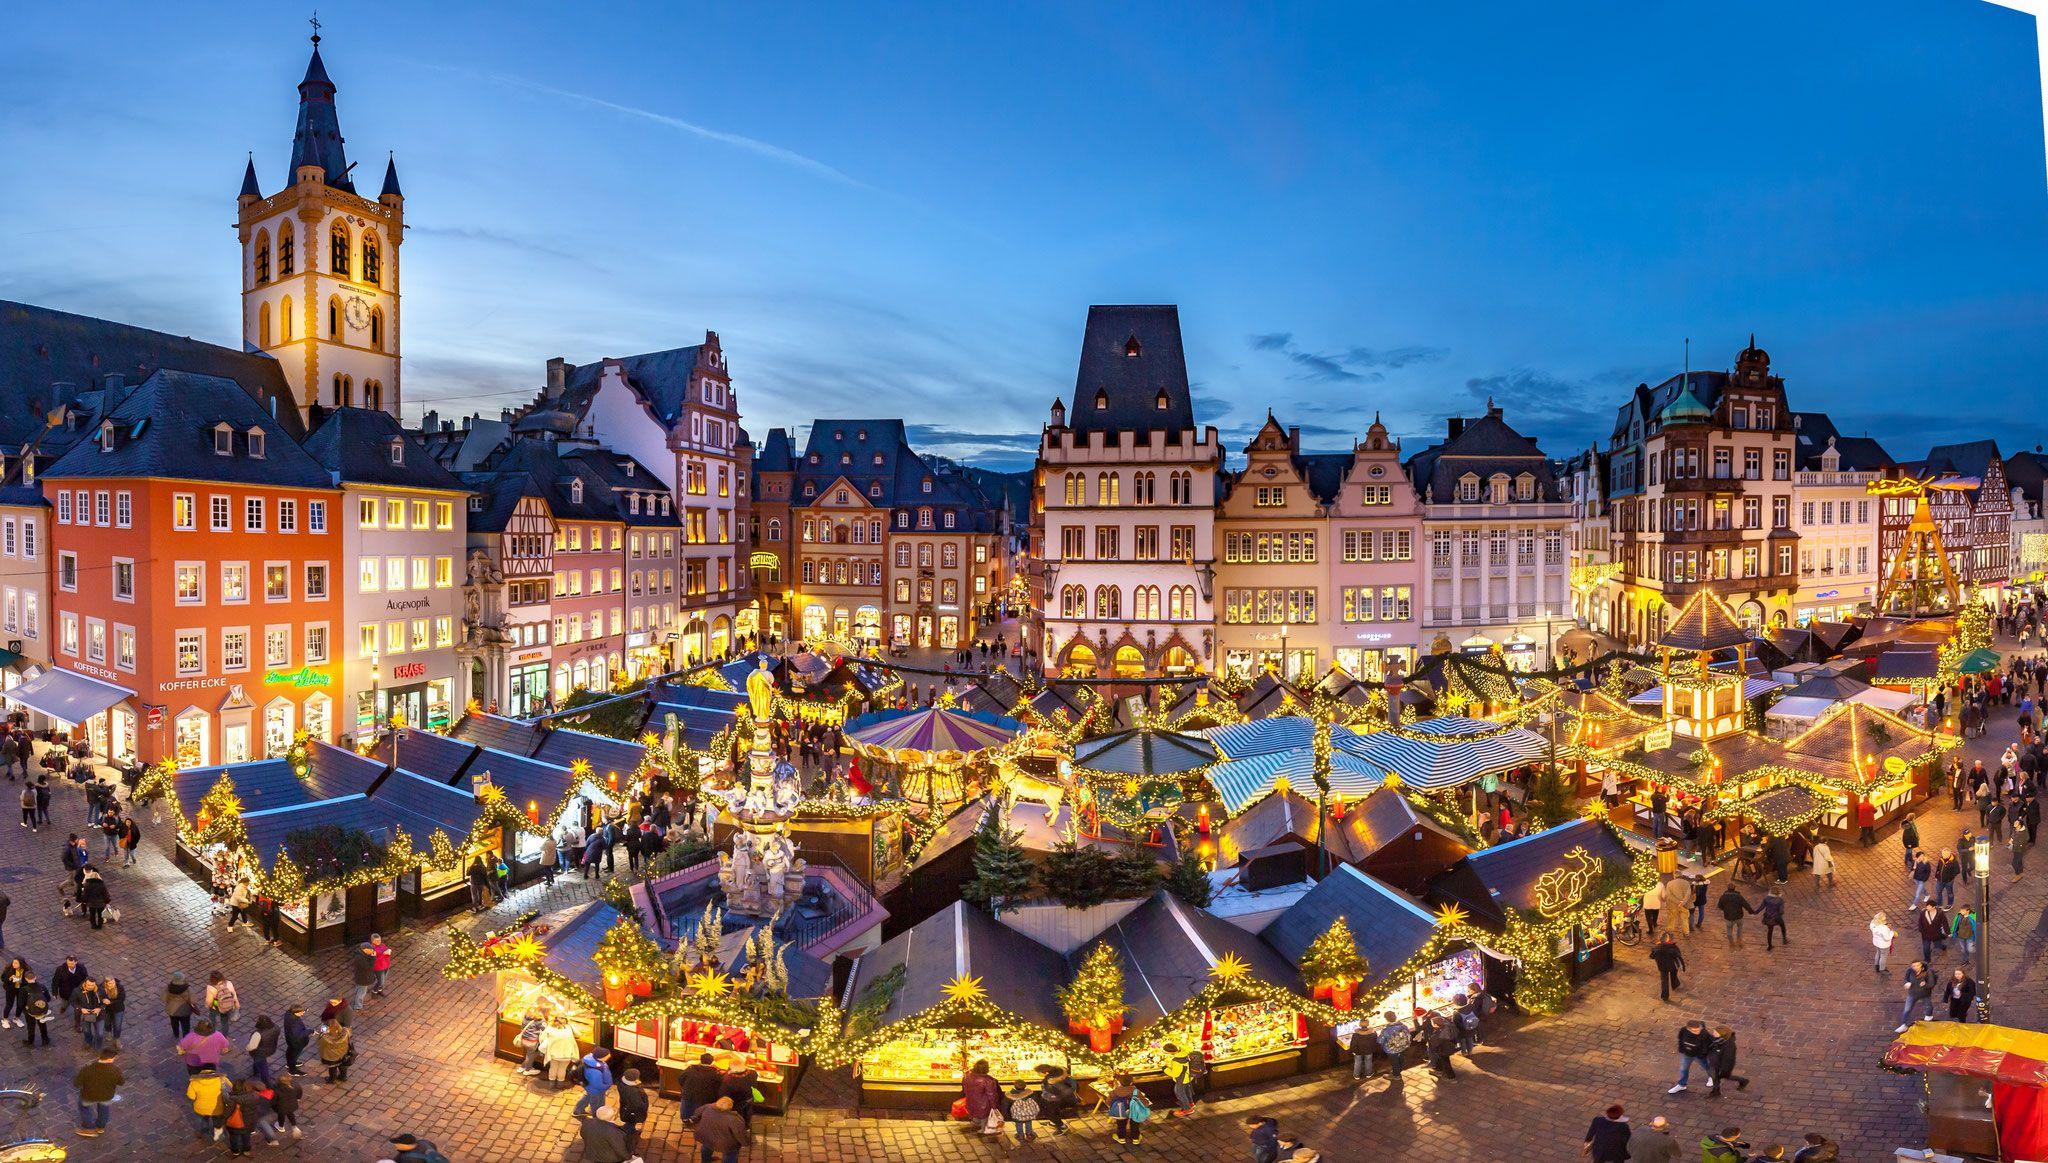 Trier Christmas Market Copyright Trierer Weihnachtsmarkt De Christmas Market Christmas Markets Europe Travel Dreams